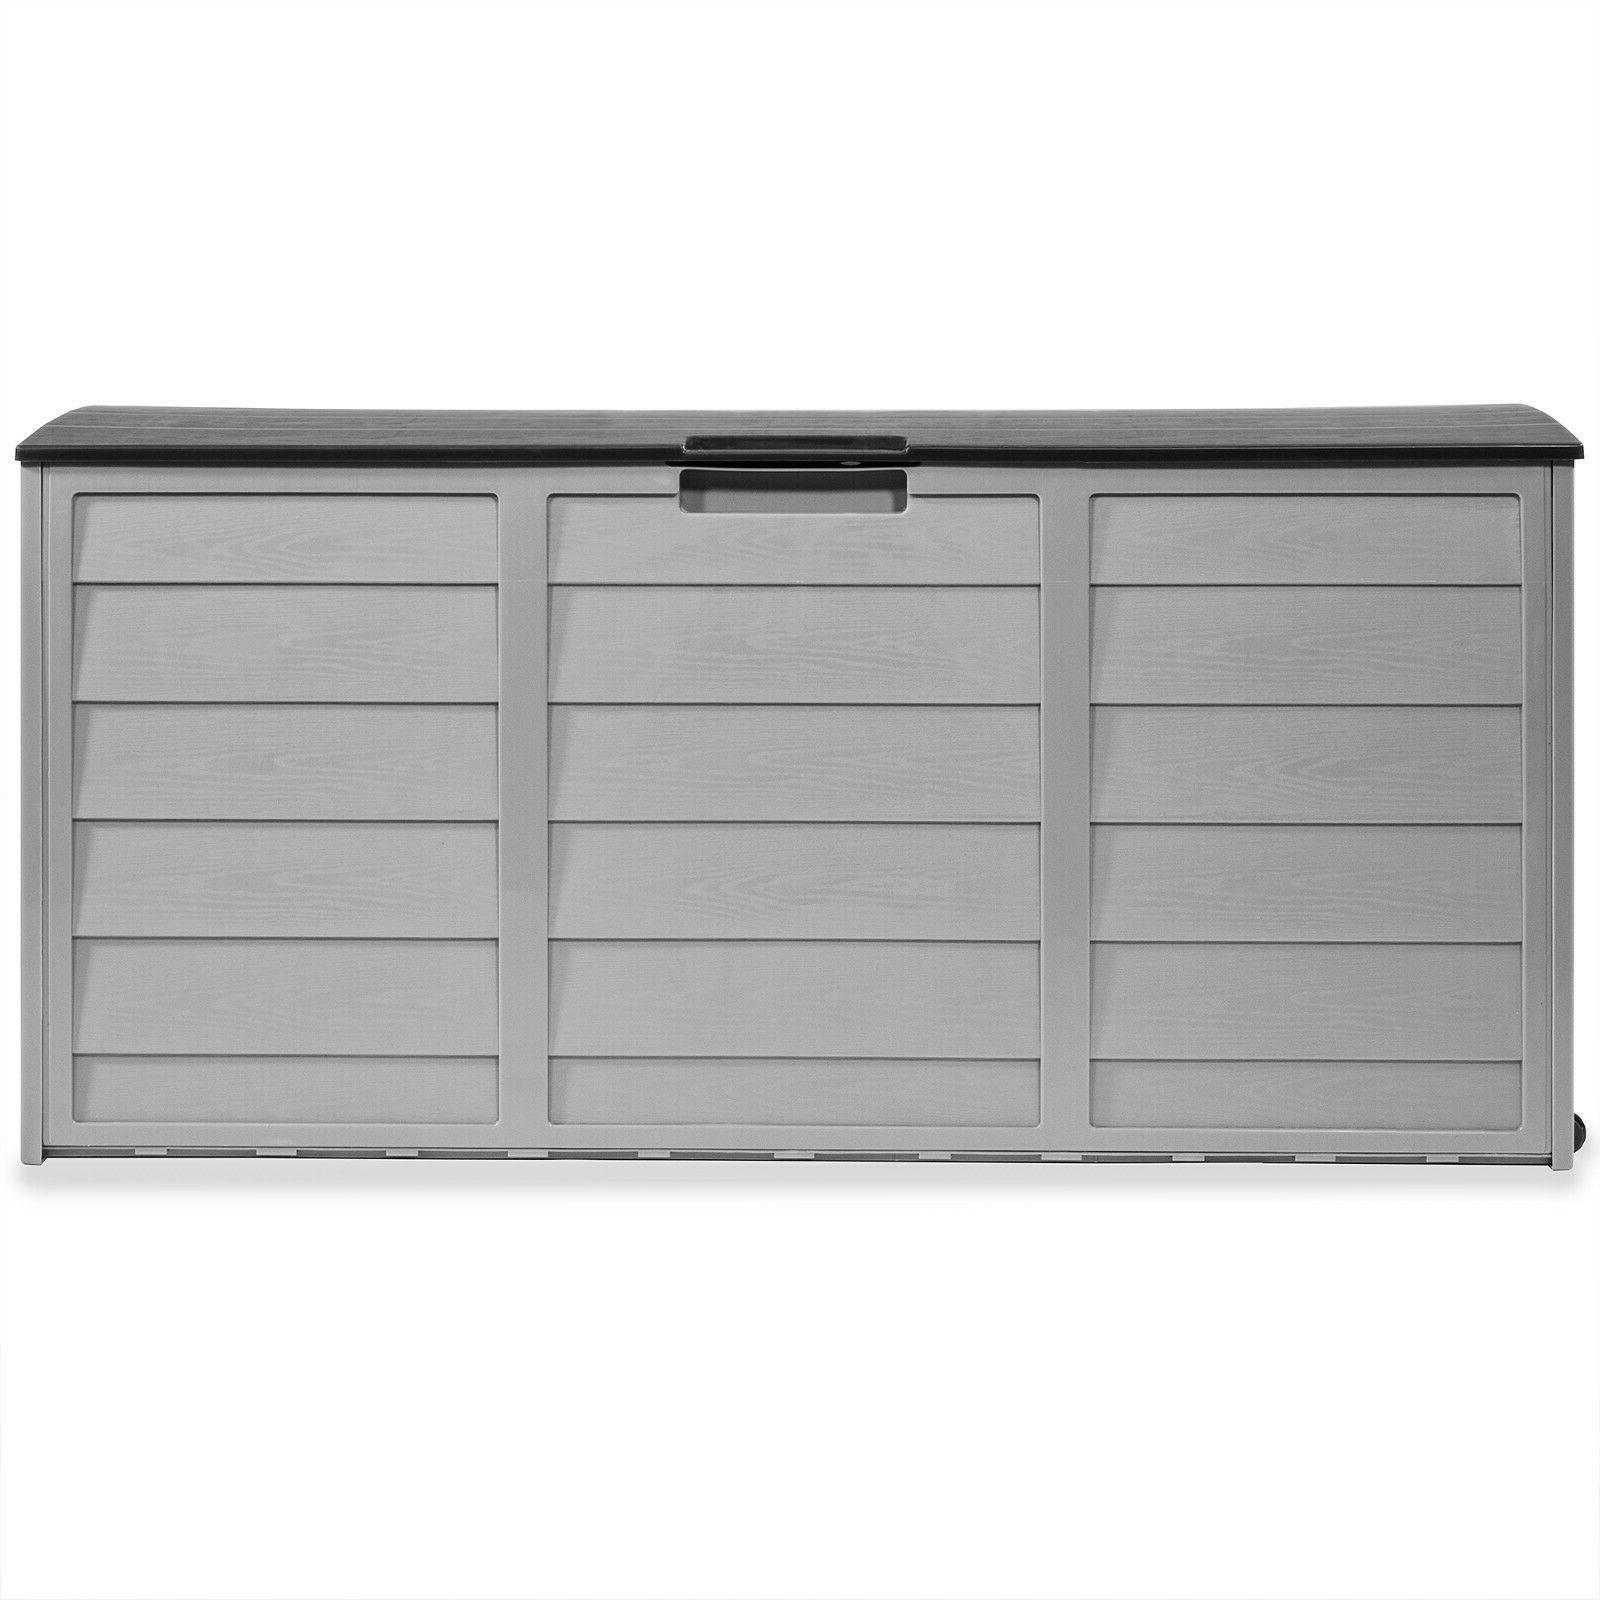 All-Weather Deck Box Storage w/ Wheel Pool Shed Bin 63